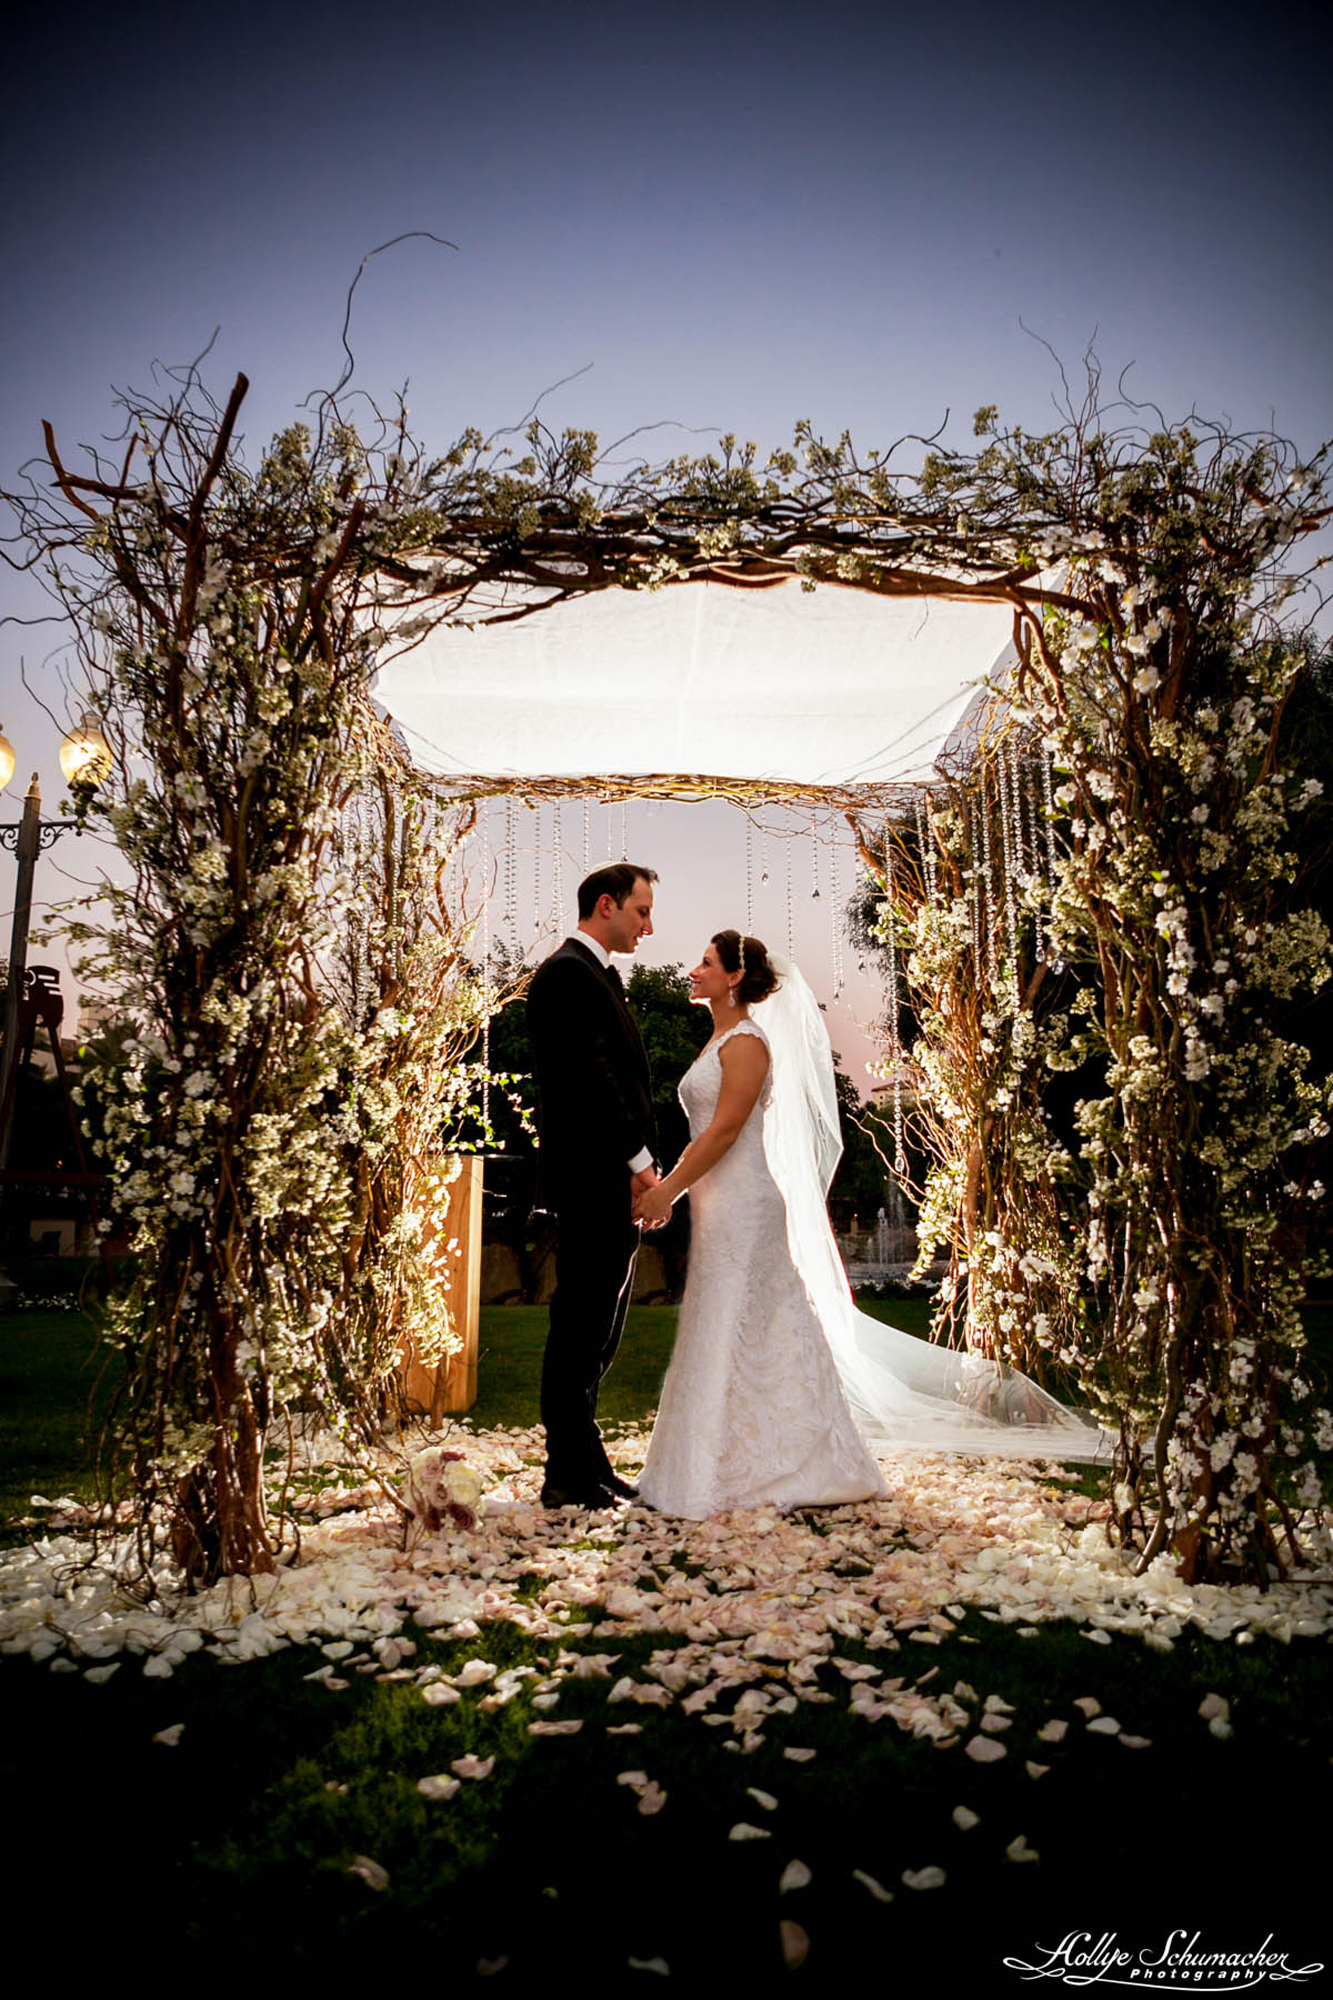 weddings-BG_0658_Hollye Schumacher Photography_Sensational_Events